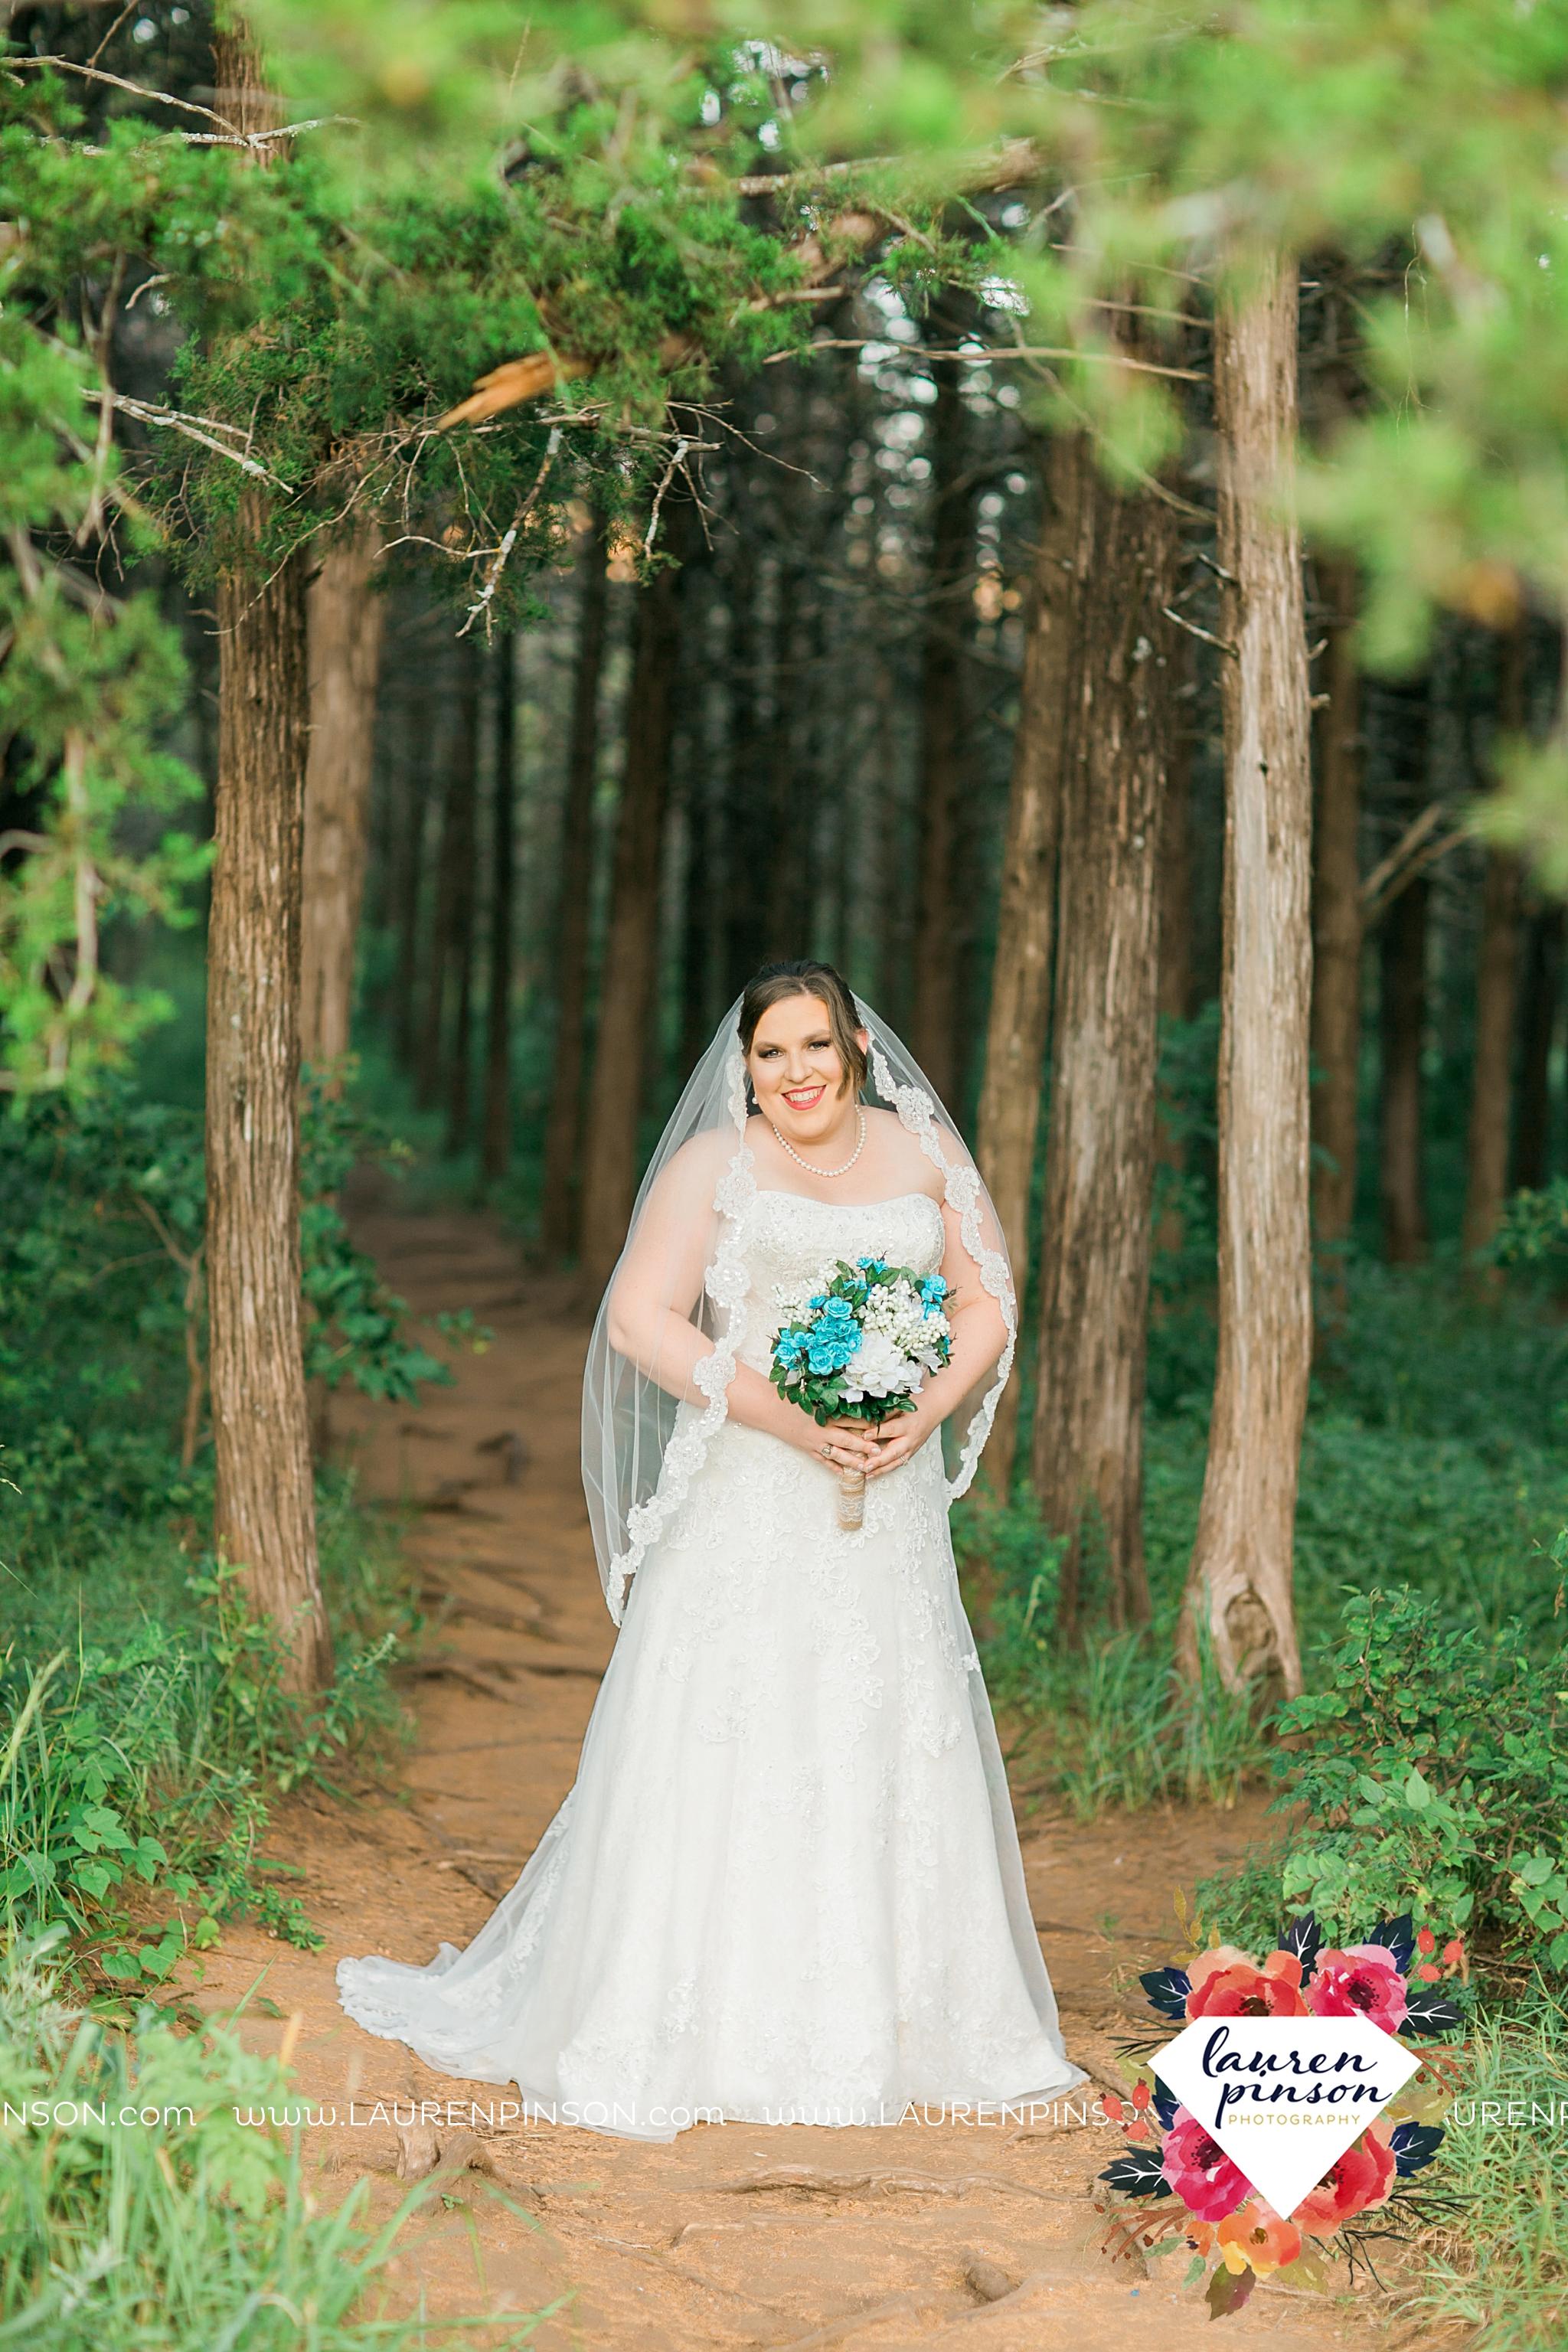 wichita-falls-texas-walters-lawton-oklahoma-wedding-photographer-wichita-mountains-bridal-portraits_3178.jpg